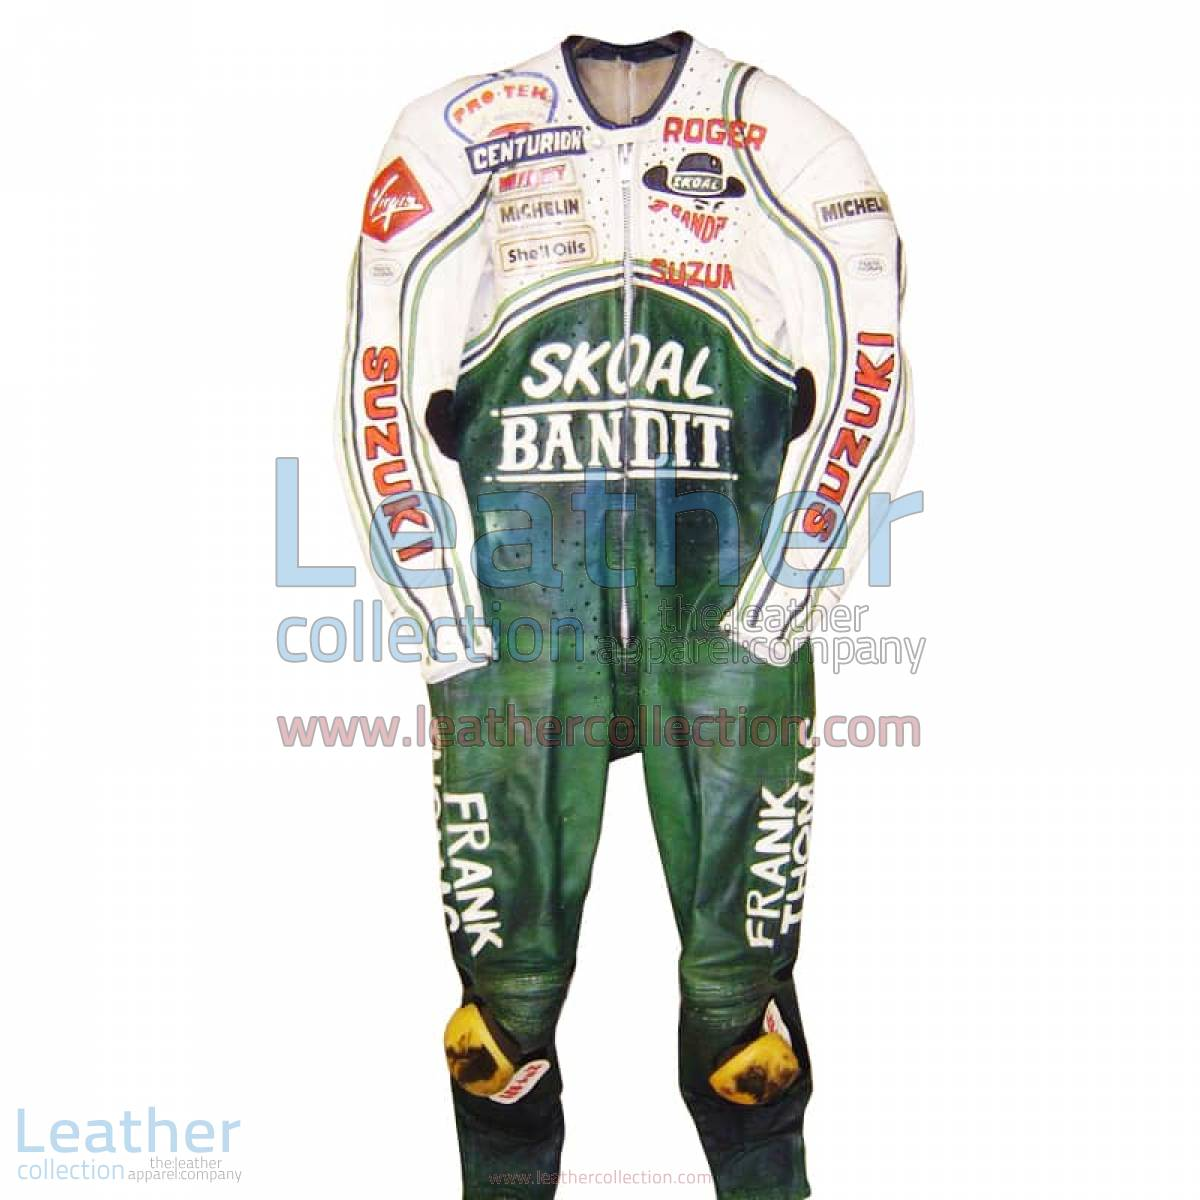 Roger Marshall Suzuki GP 1987 Leather Suit   suzuki leather suit